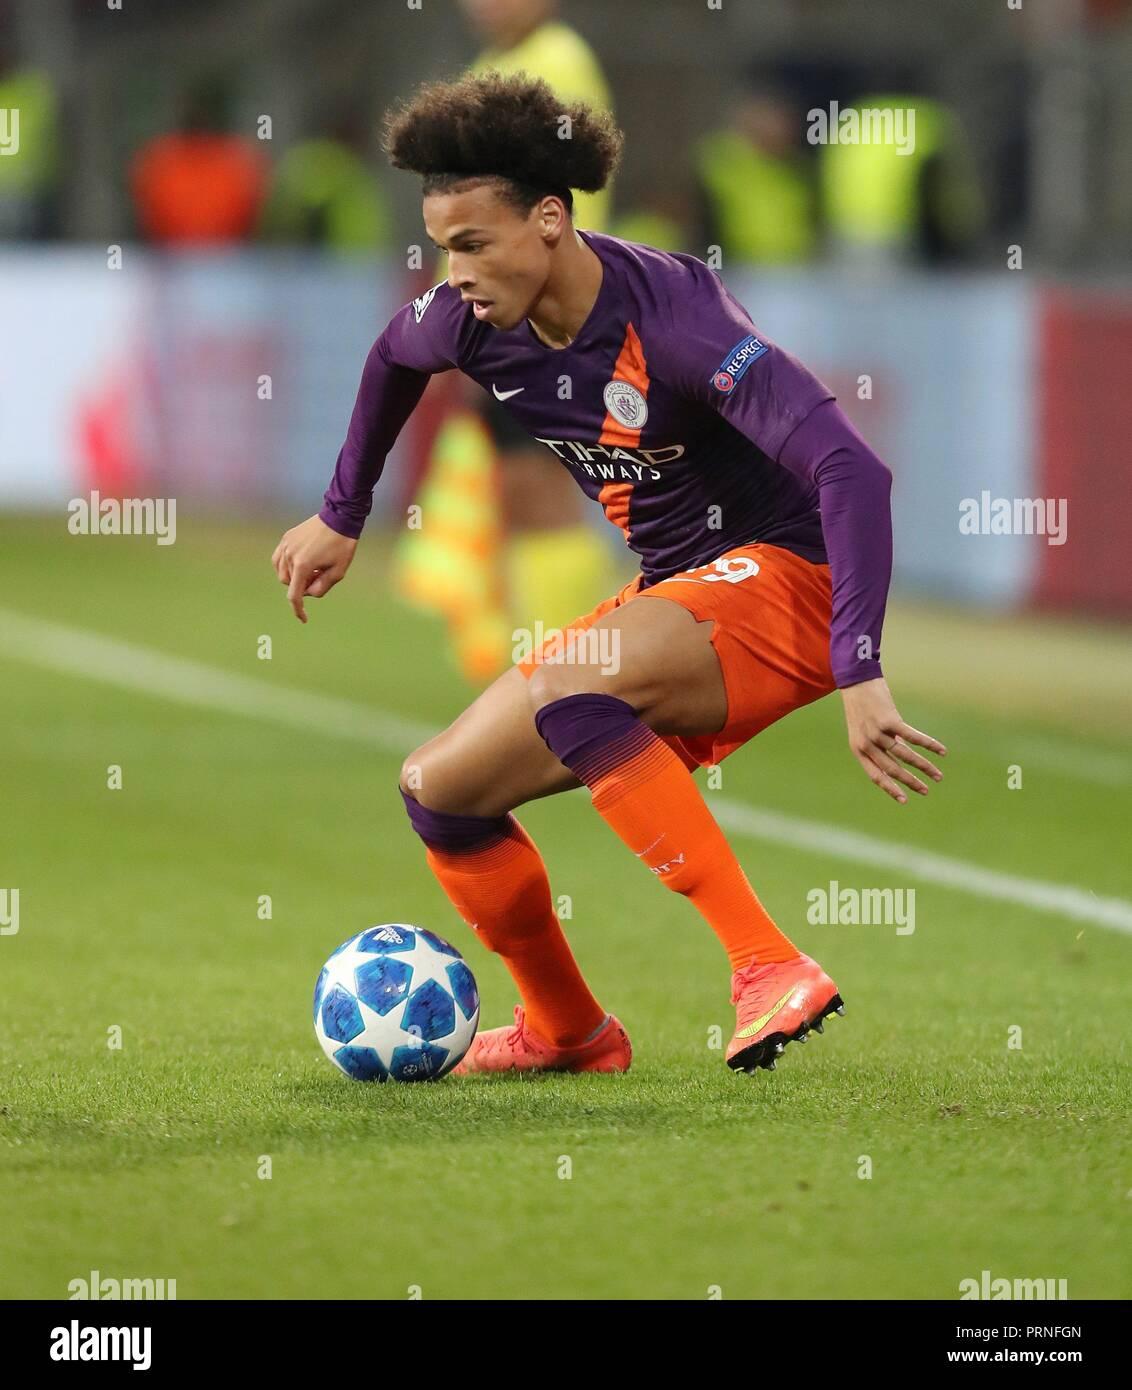 firo: 02.10.2018 Football, Football, Champions League: TSG Hoffenheim - Manchester City 1: 2 single action, Leroy Sane,   usage worldwide - Stock Image